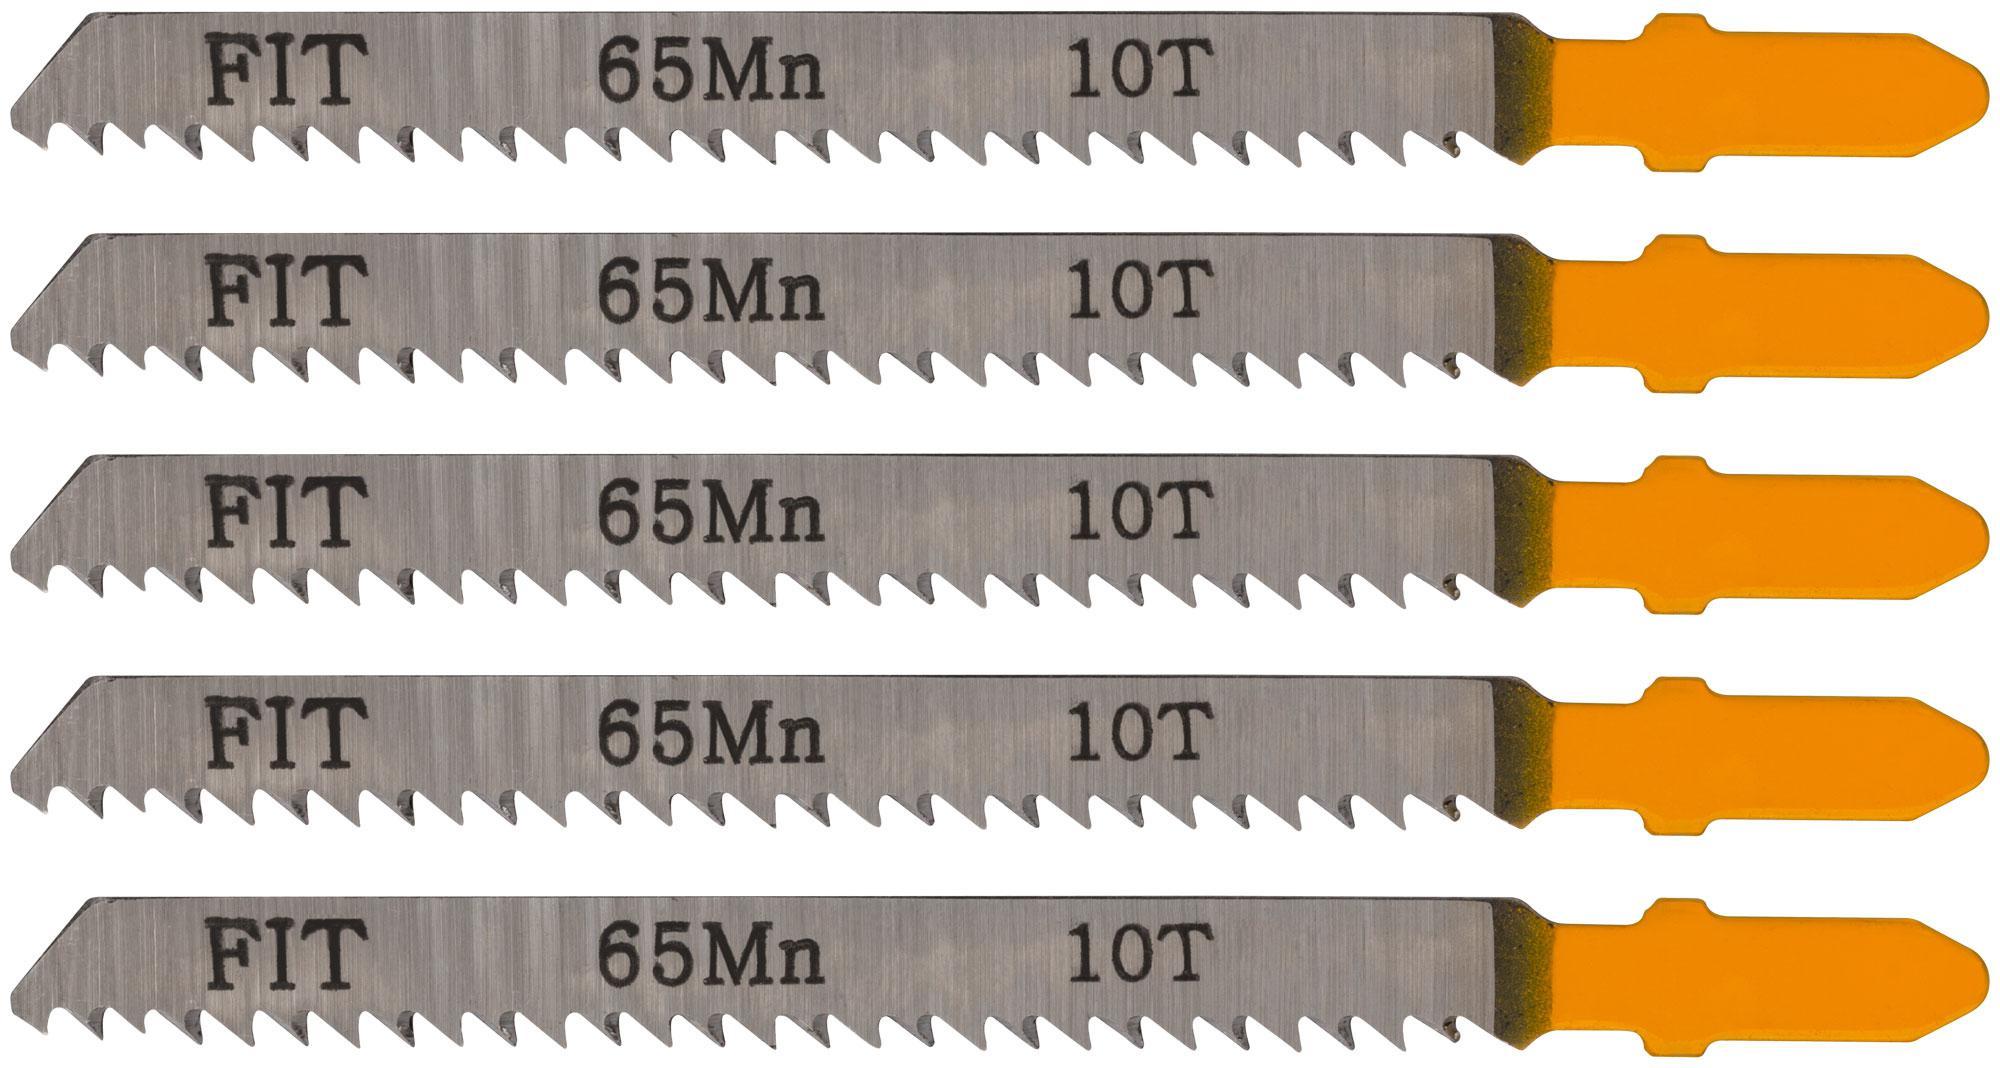 Пилки для лобзика Fit 41109 пилки для лобзика по дереву набор 5 шт стандарт